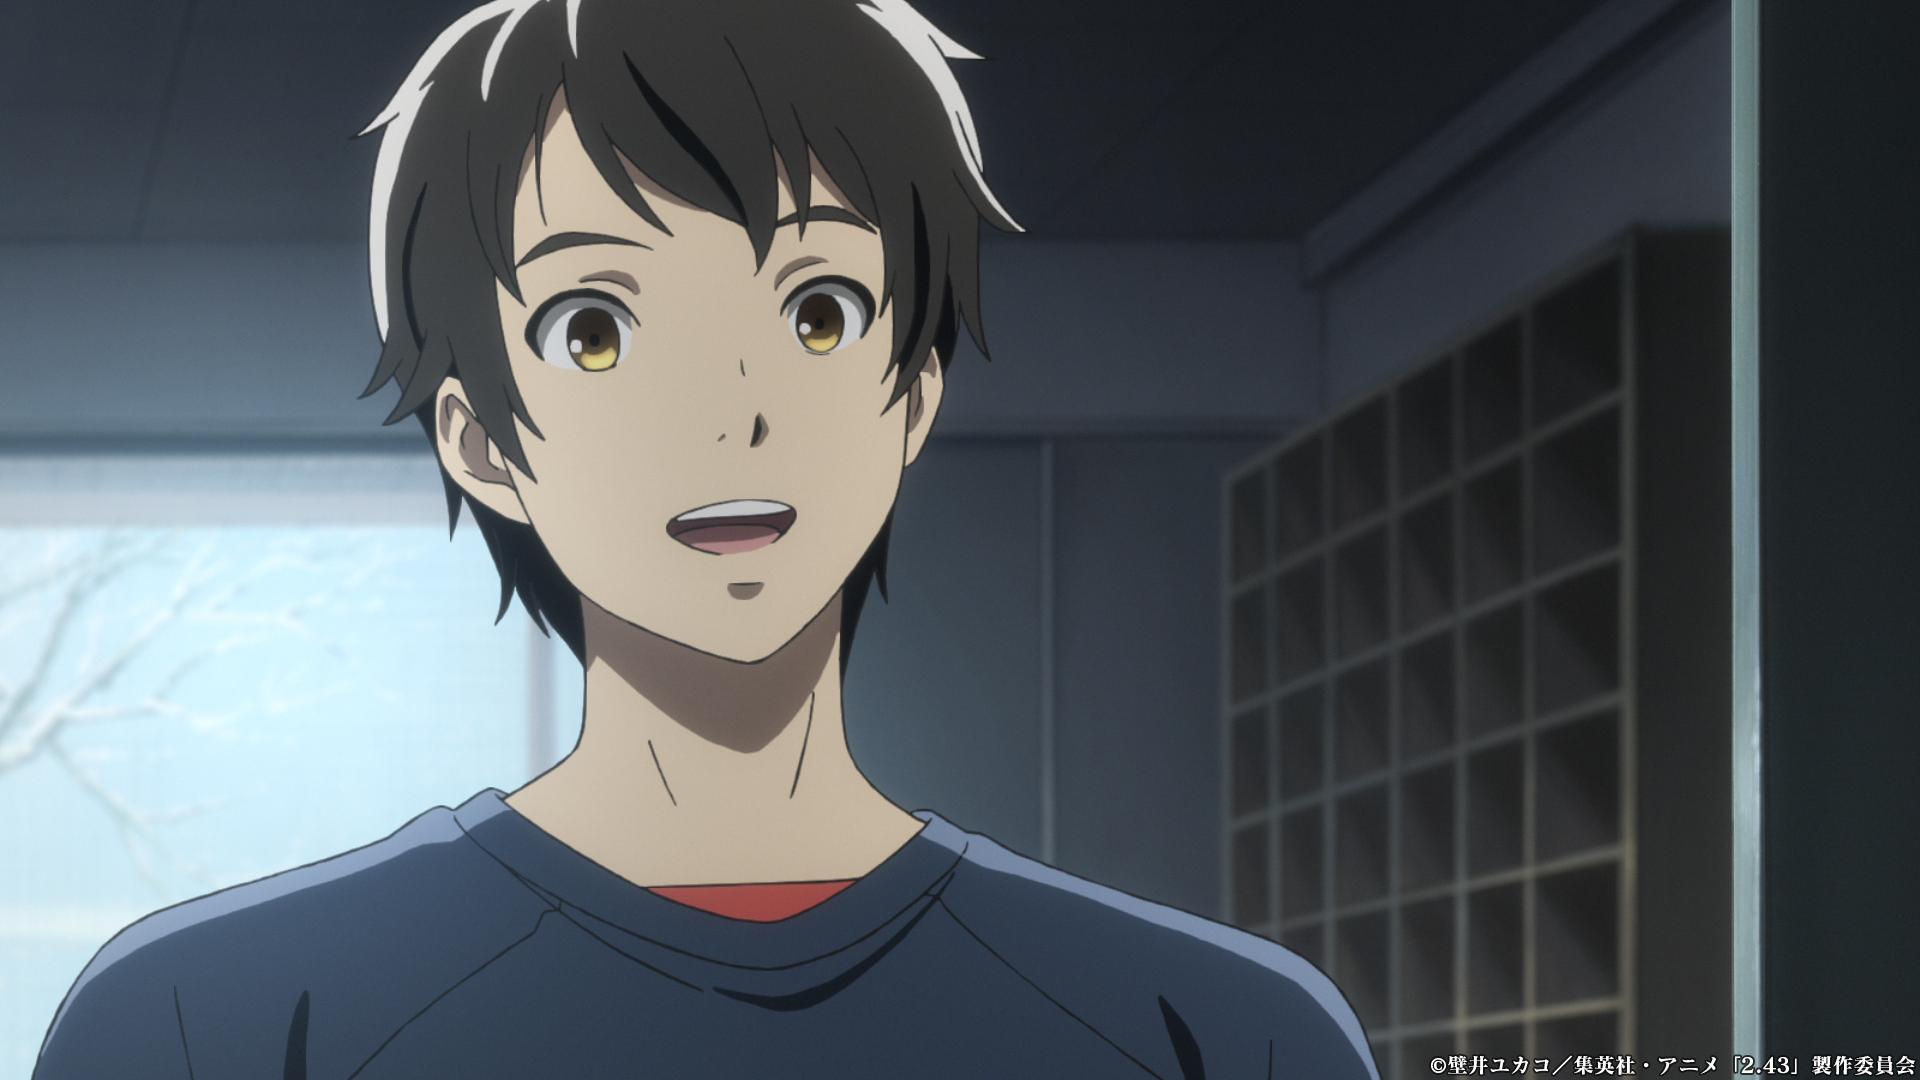 TVアニメ「2.43清陰高校男子バレー部」第2話「最高で最低のプレイメイカー」場面写1